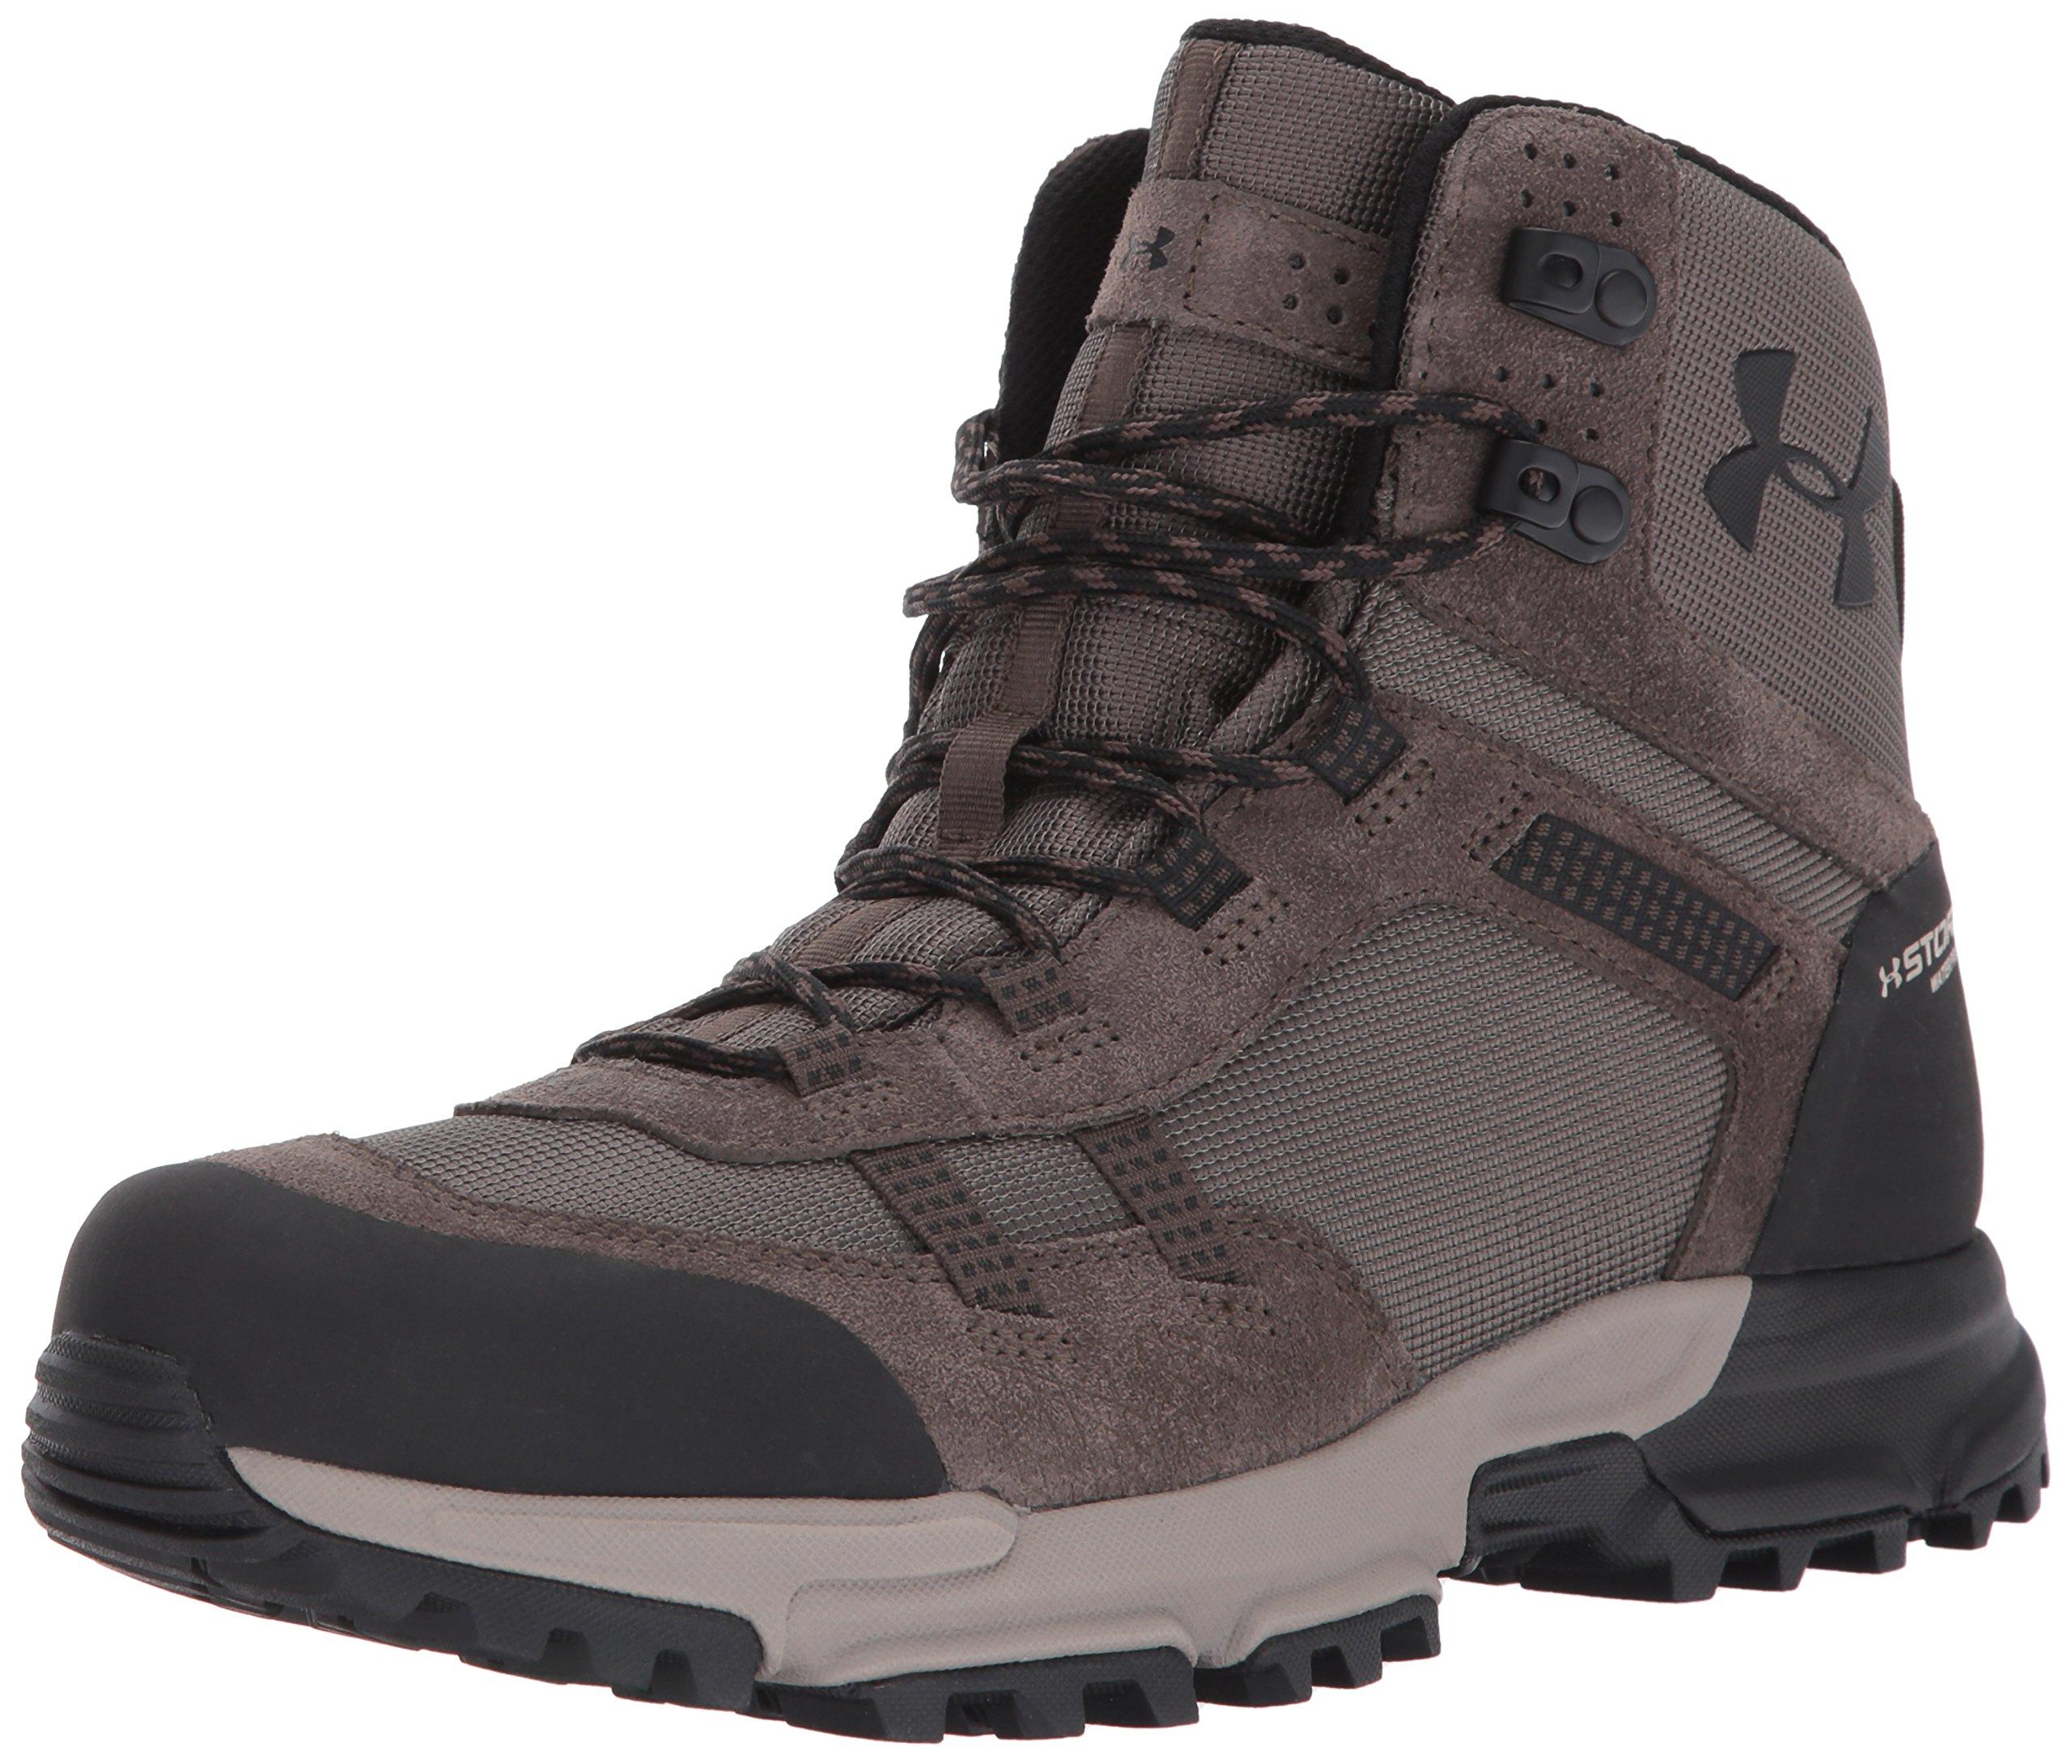 Under Armour Men's Post Canyon Mid Waterproof Hiking Boot, Maverick Brown (100)/Black, 11.5